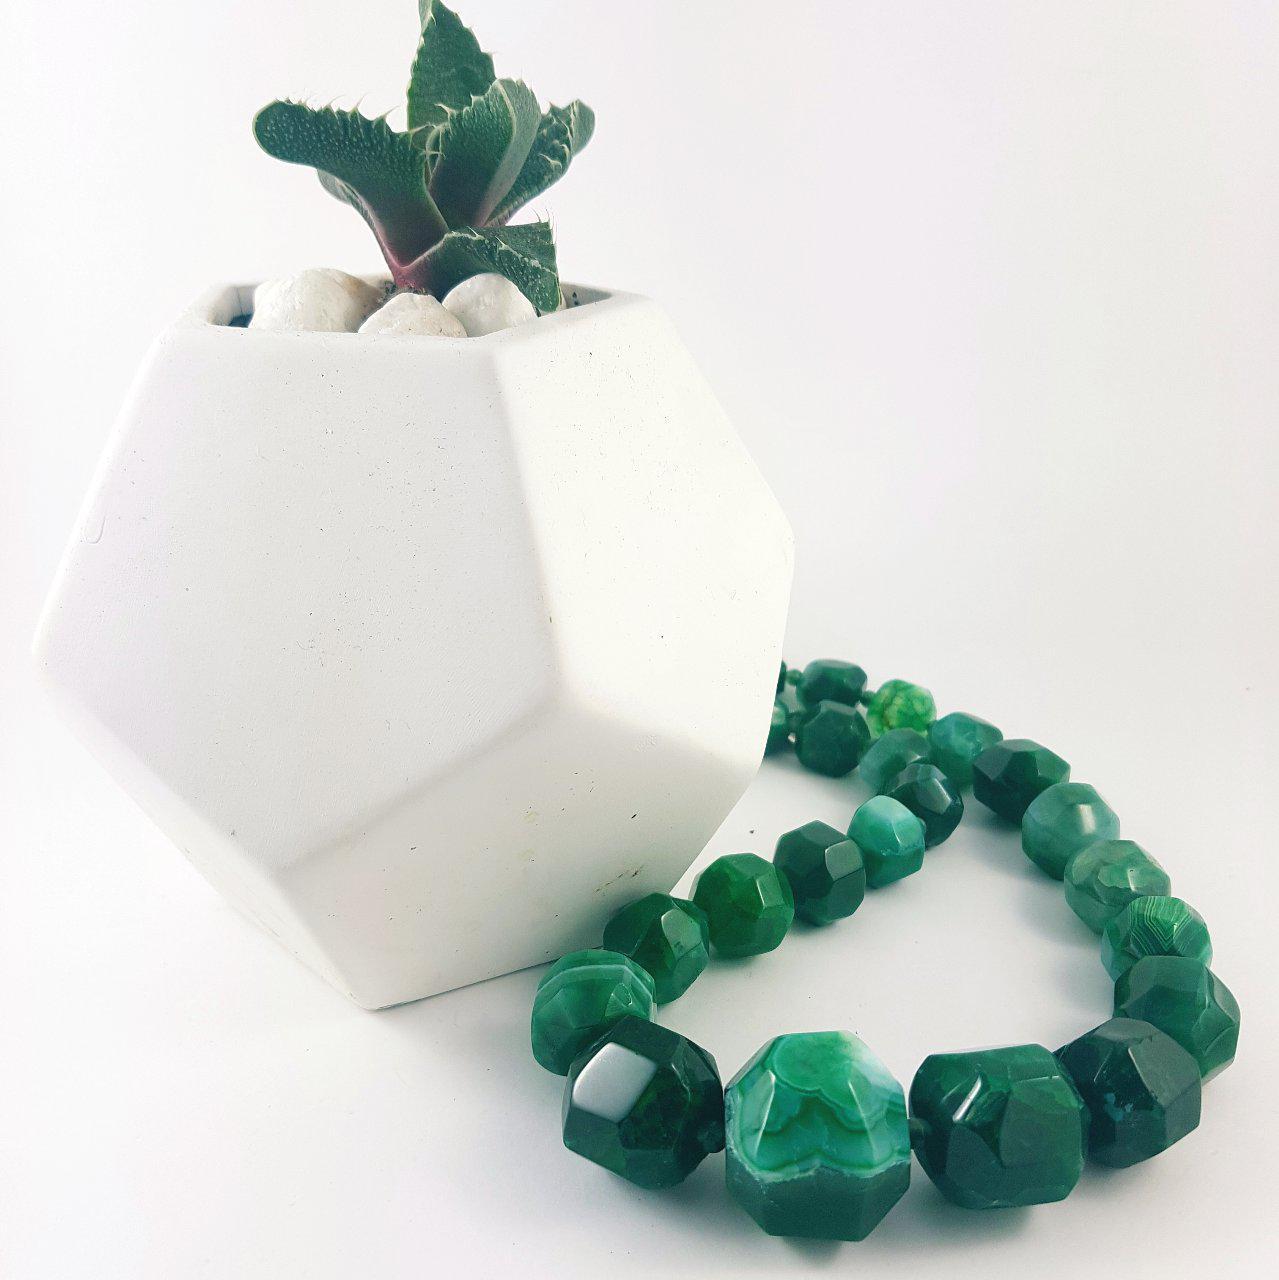 Wilma - Green Agate